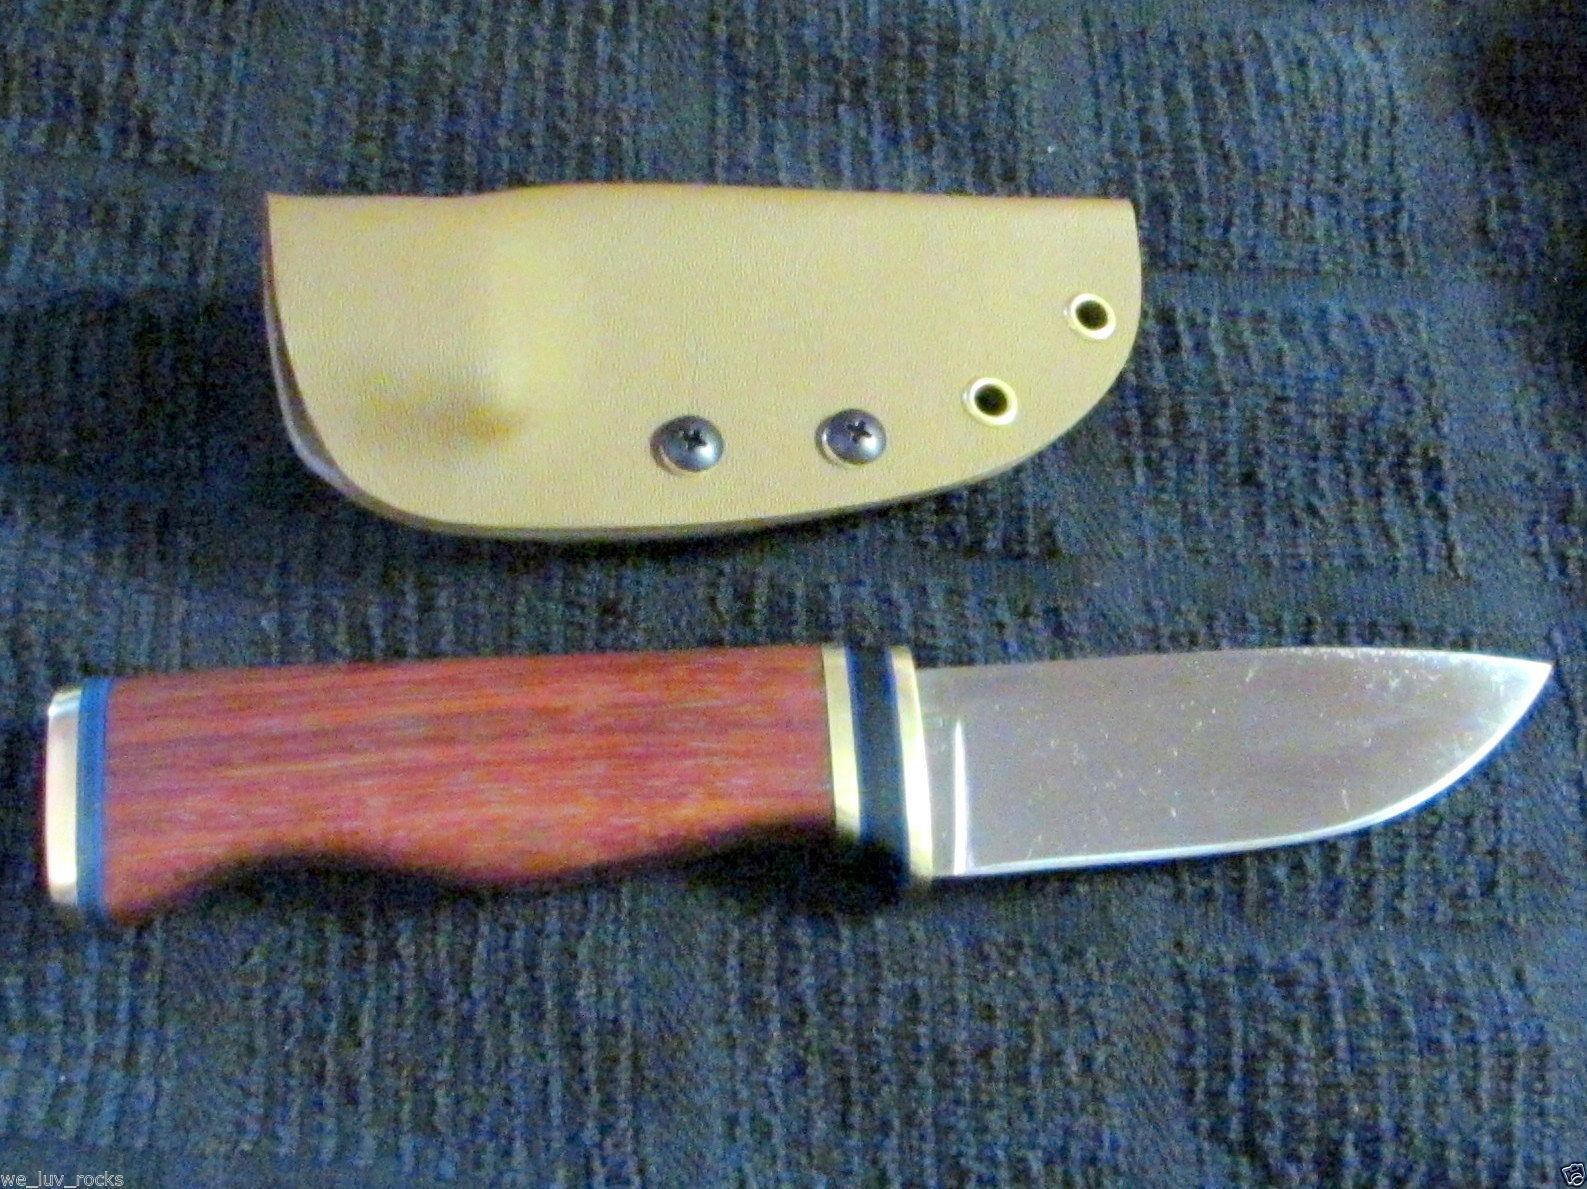 Bushcraft hunting knife D2 Tool Steel handmade hardwood handle Kydex sheath 2B